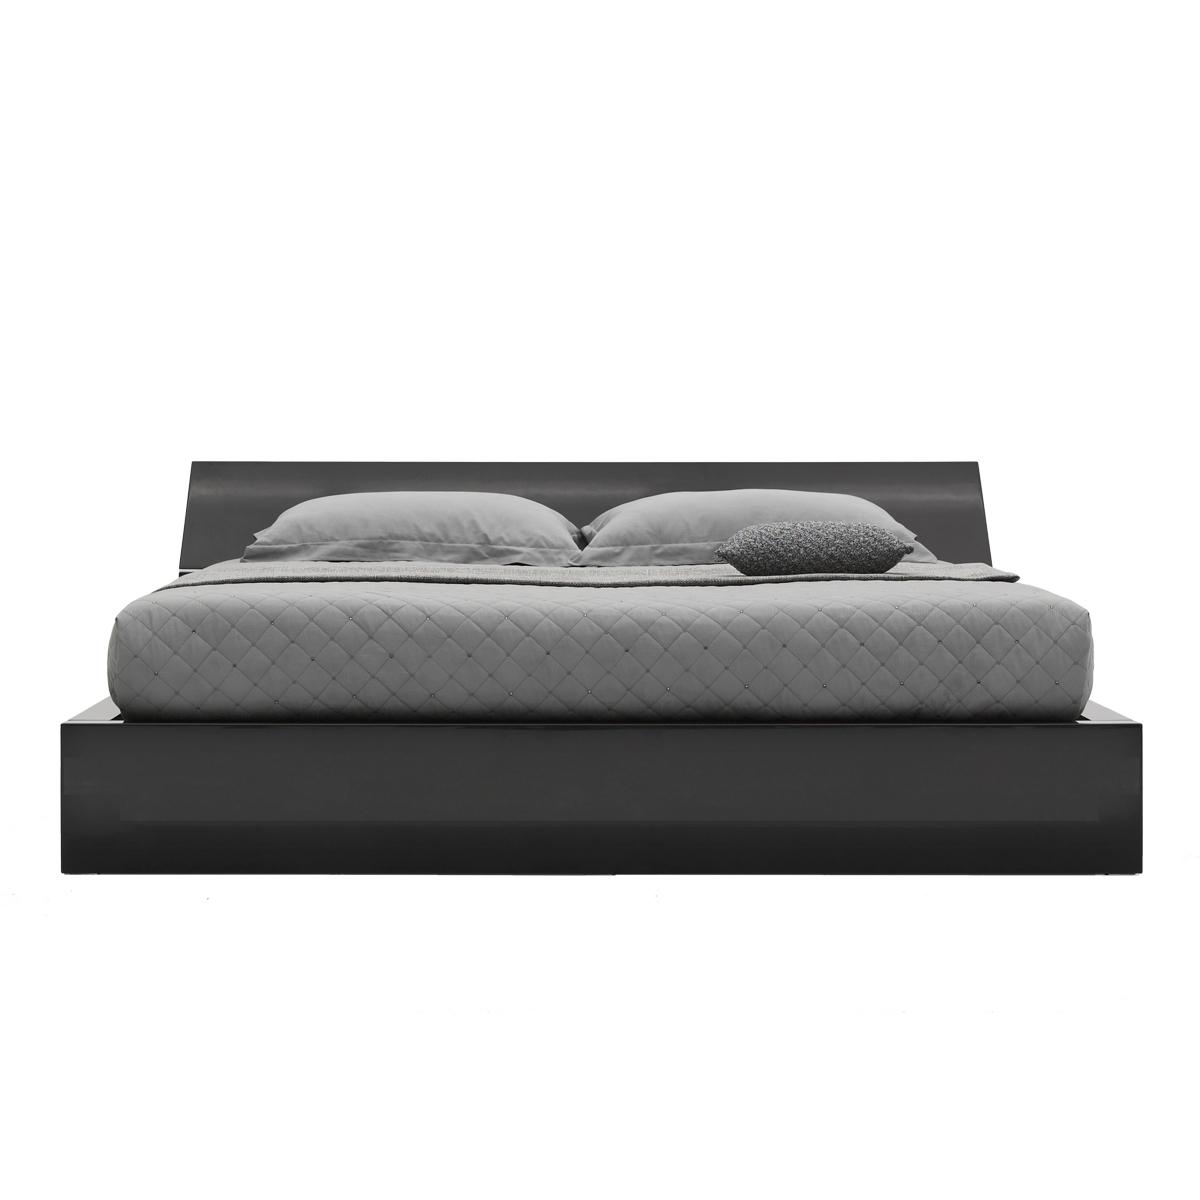 CASSETTI STORAGE BED-1